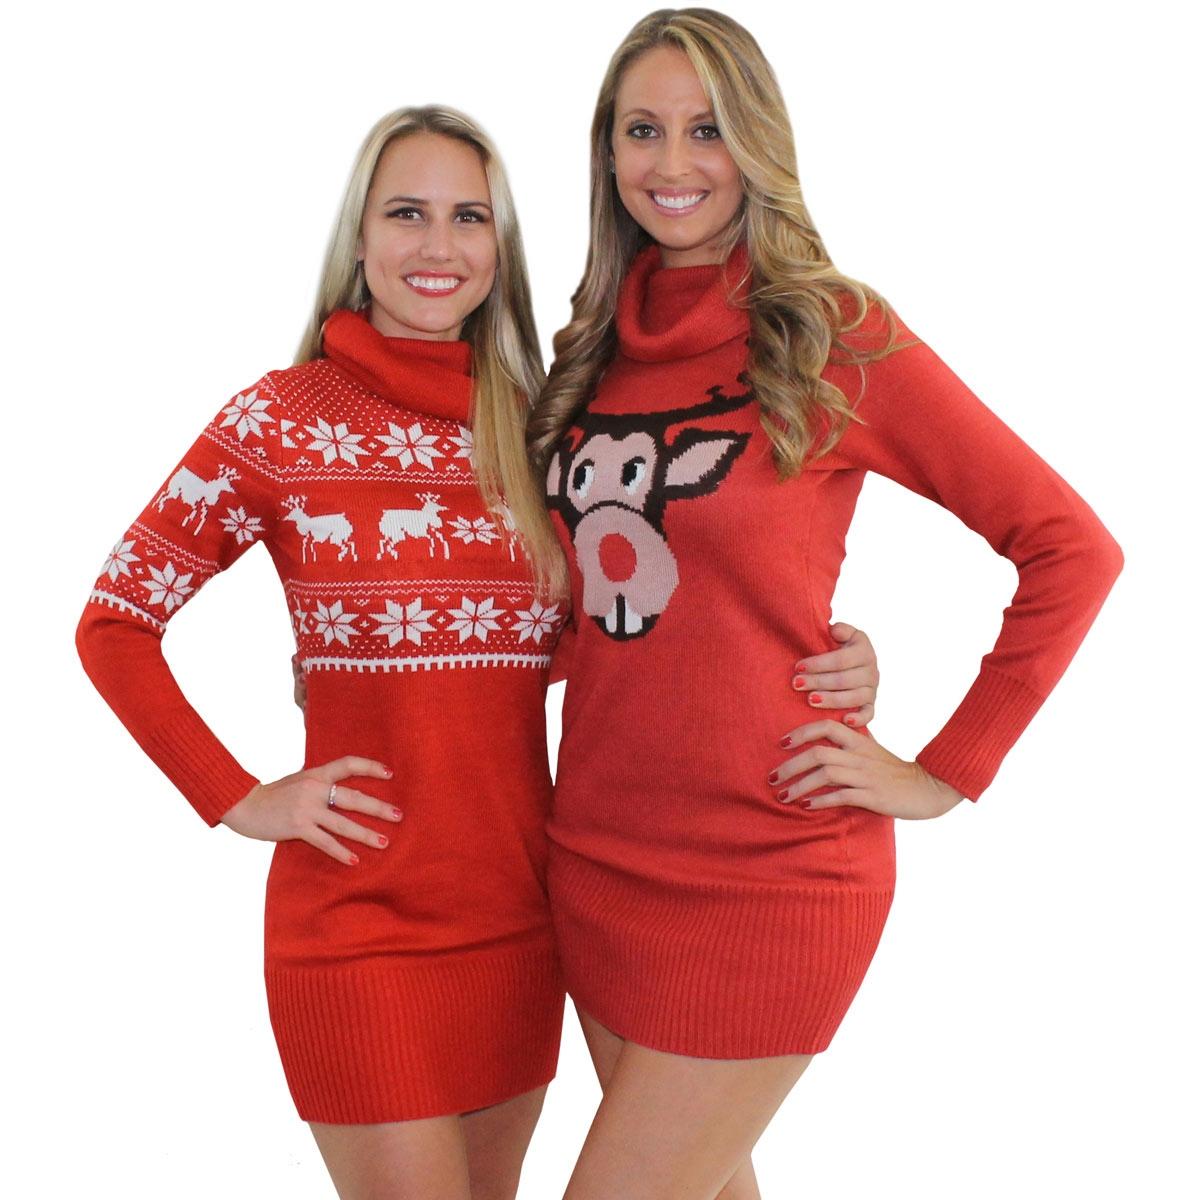 Women Christmas Sweater Dress.Christmas Sweater Dress Picture Collection Dressedupgirl Com